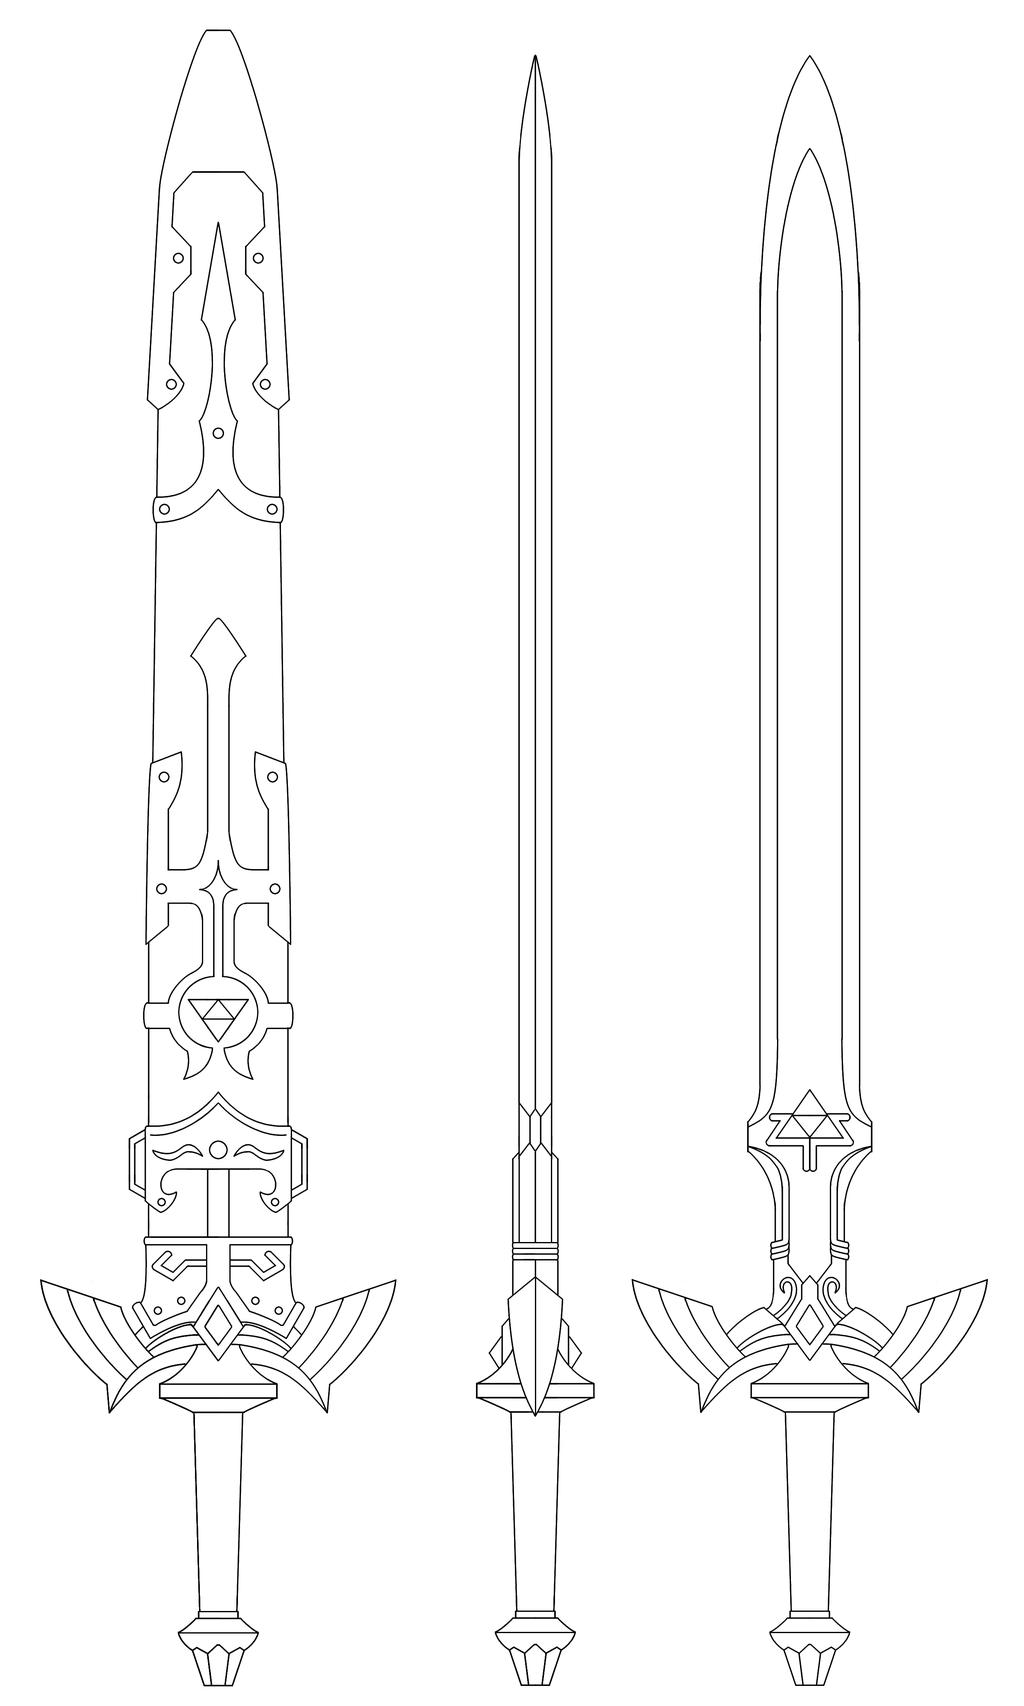 Zelda twilight princess coloring pages - Master Sword Blueprint Twilight Princess By Fridator